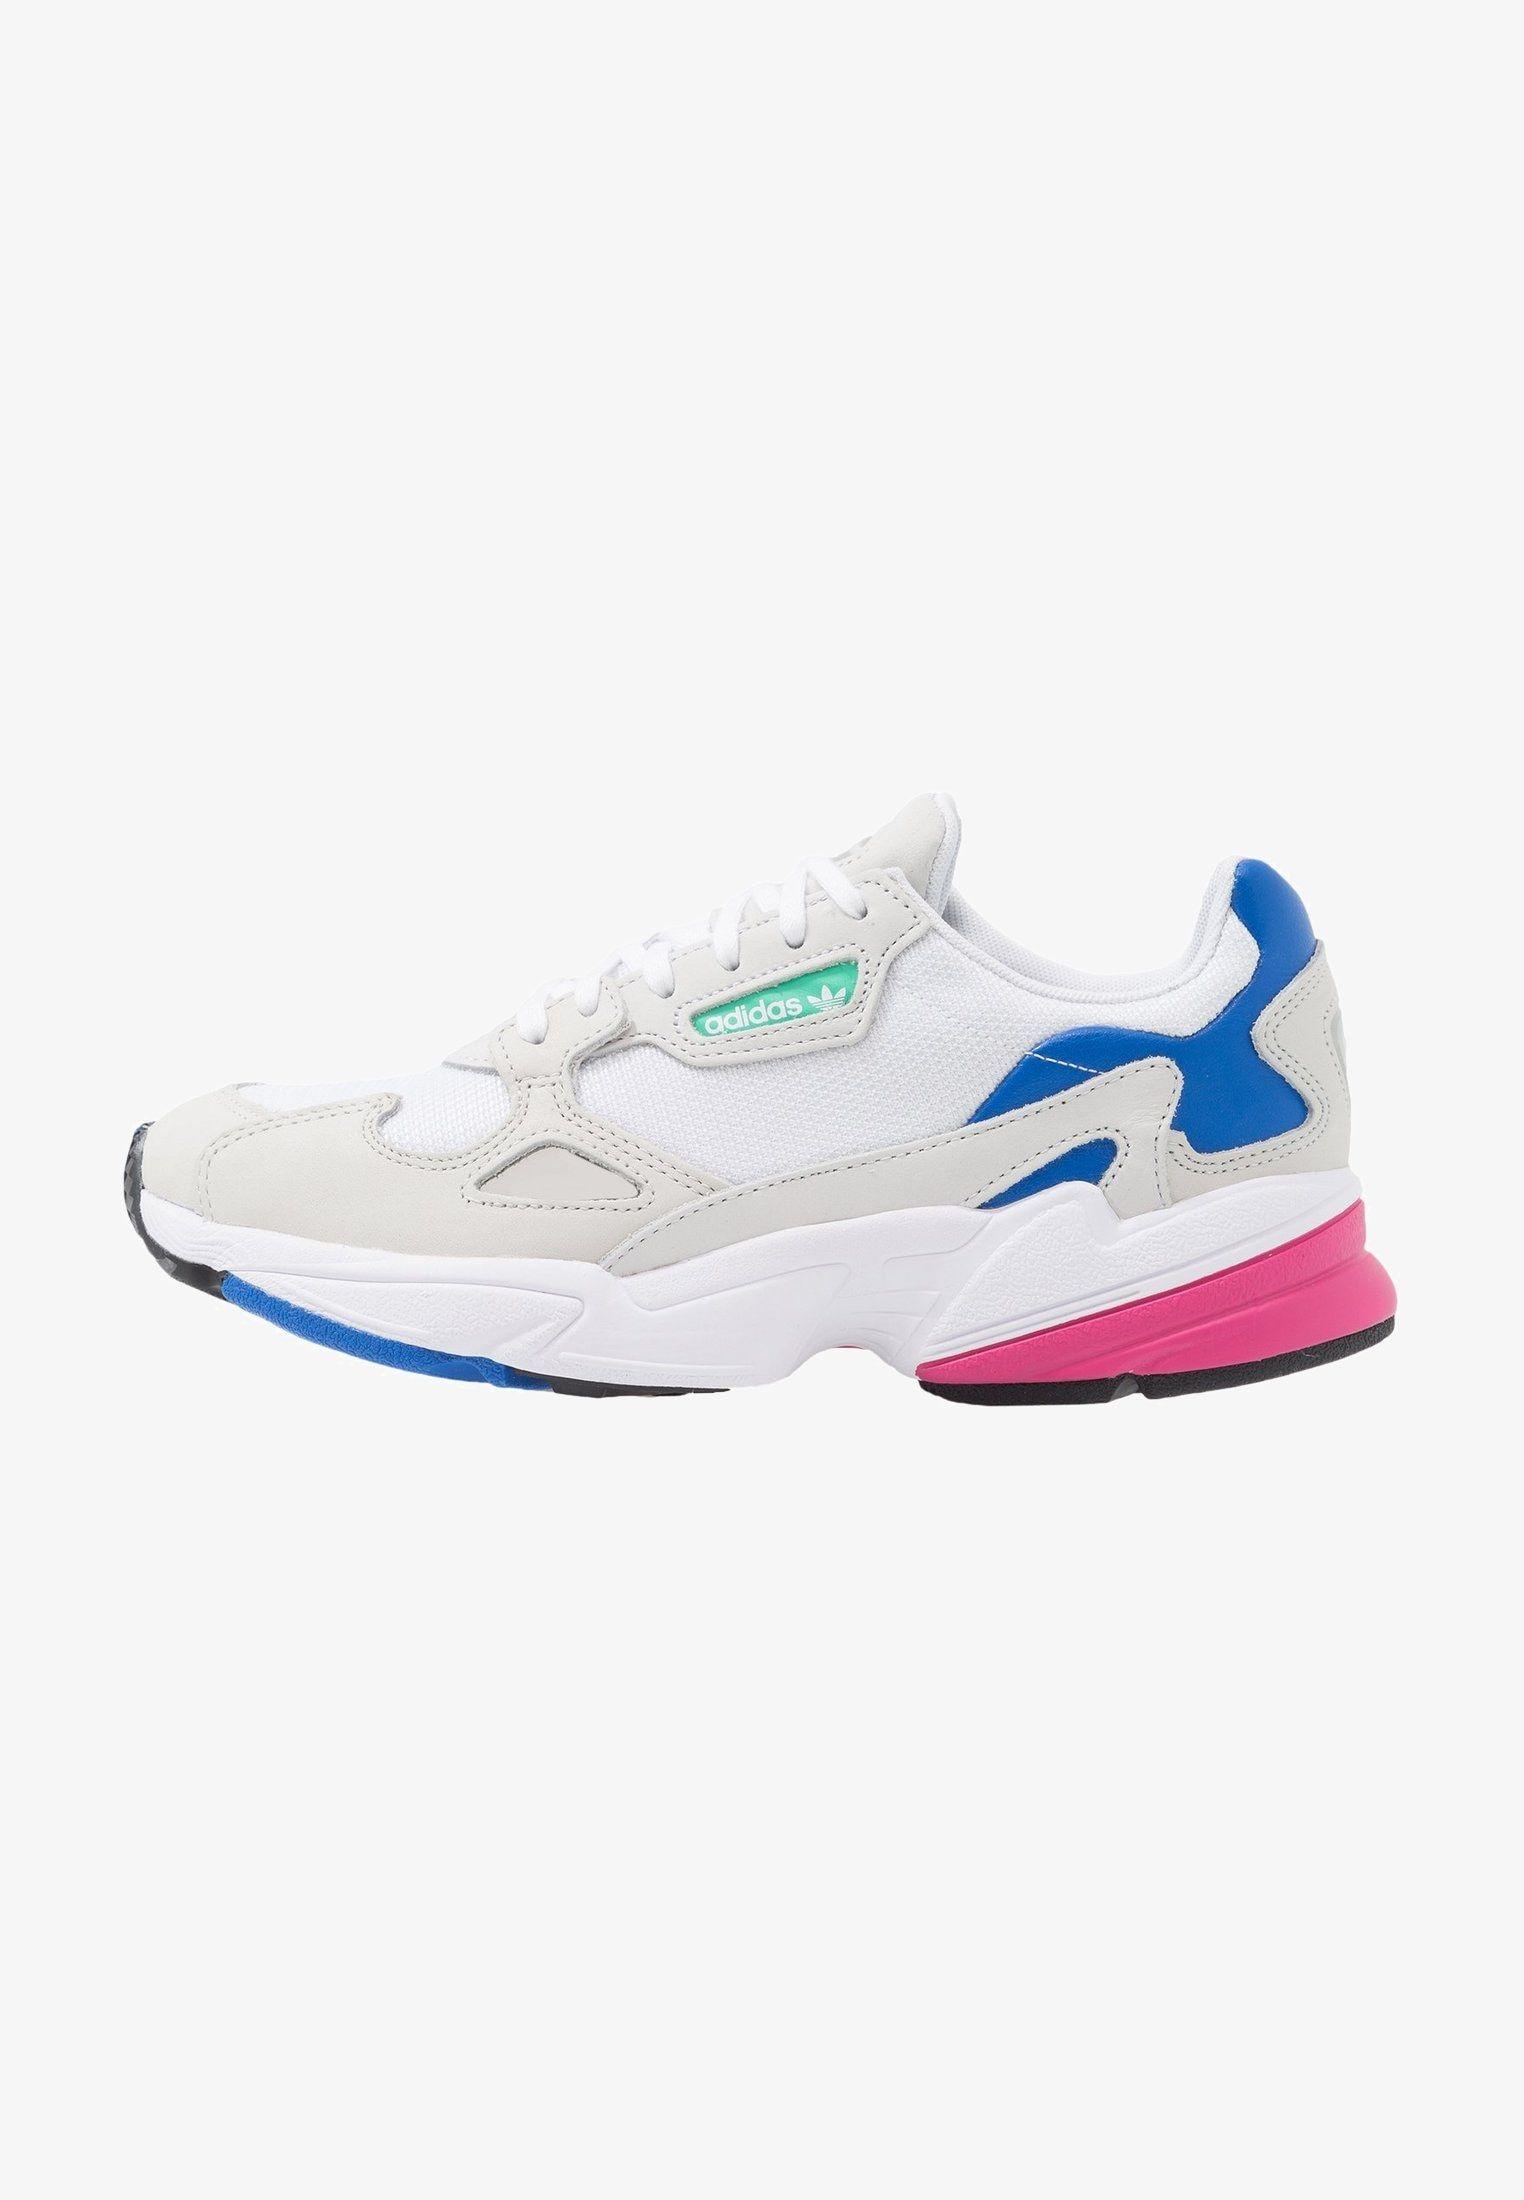 FALCON Baskets basses footwear whitegrey oneblue